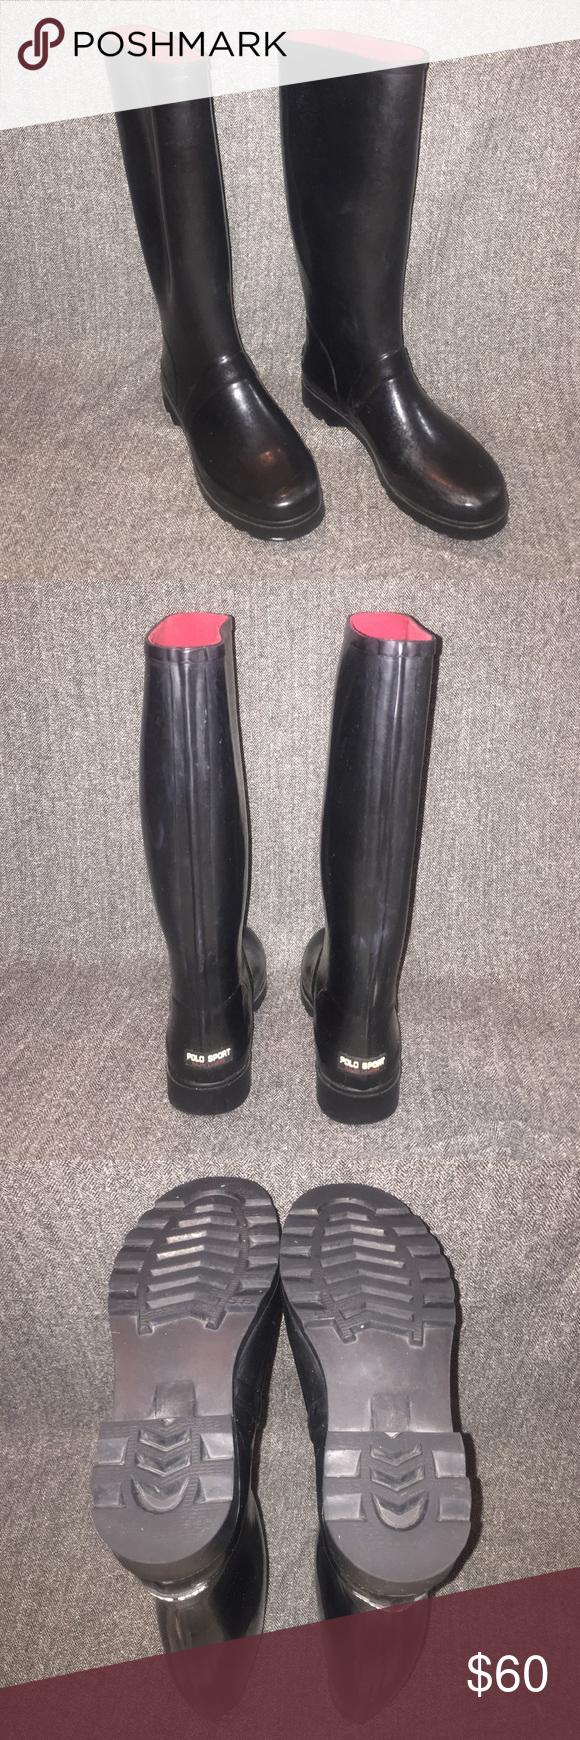 POLO SPORT High Rain Boots   Boots